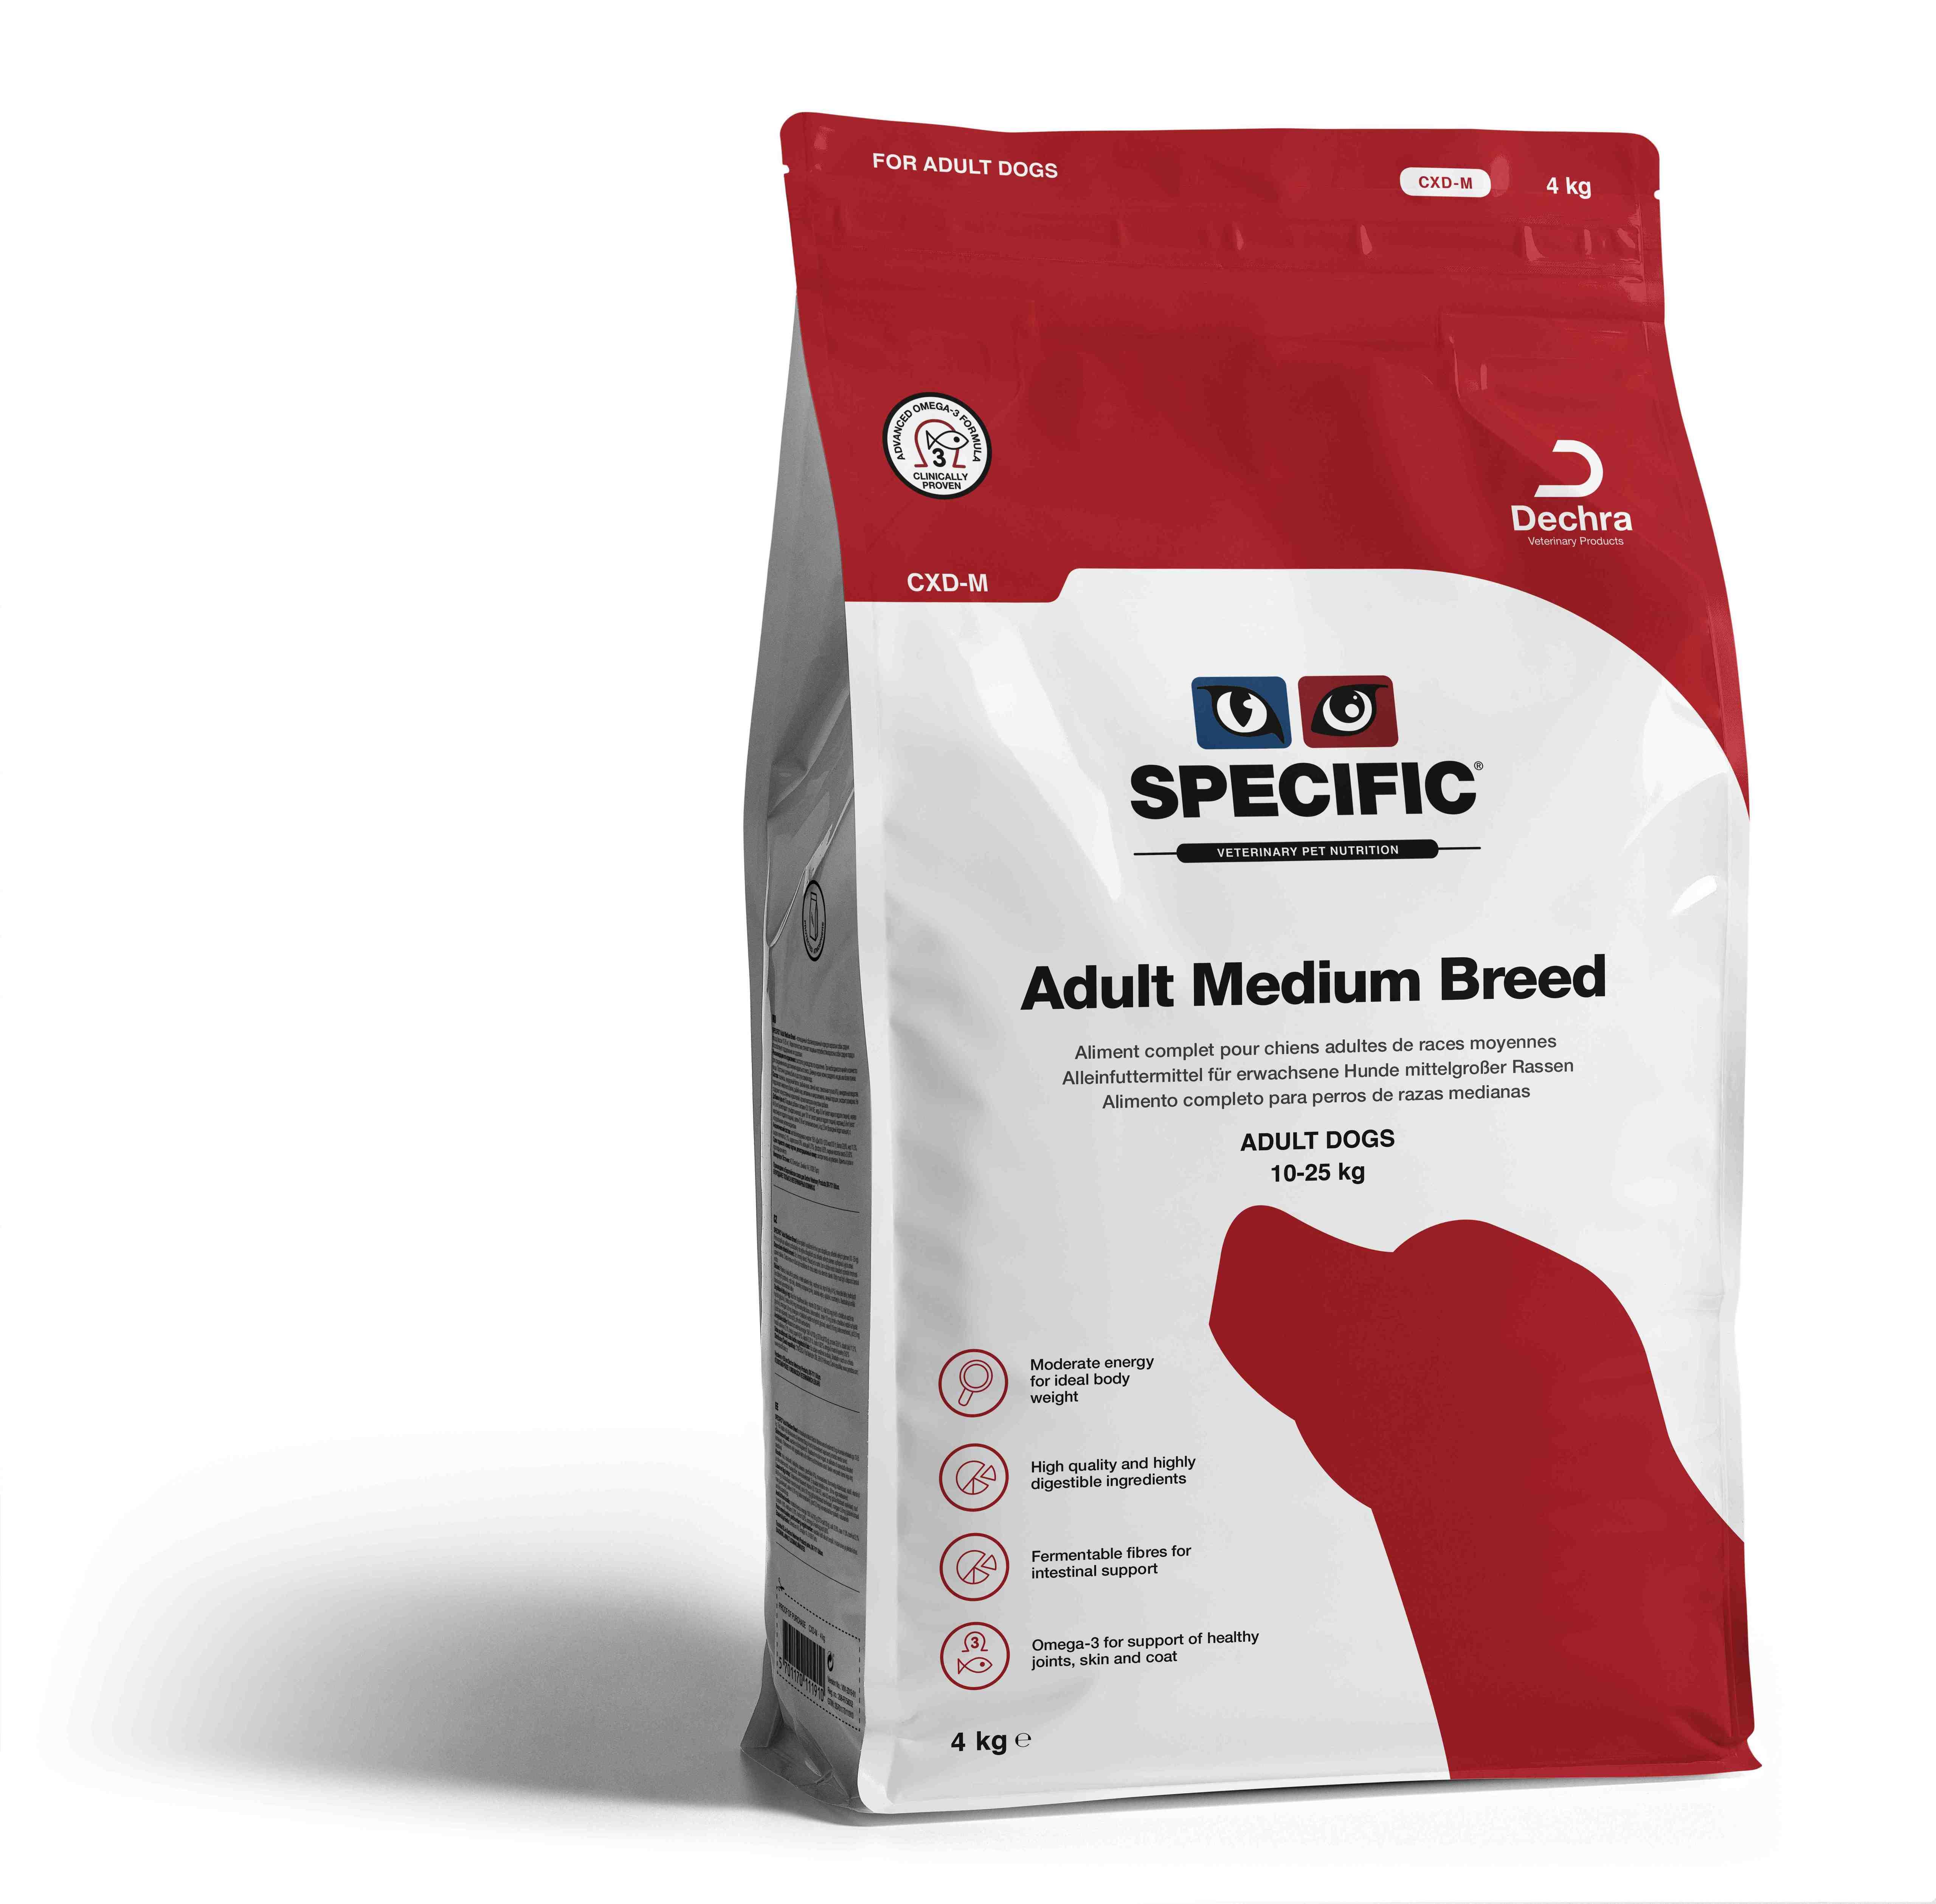 Adult Medium Breed CXD-M - 4 kg